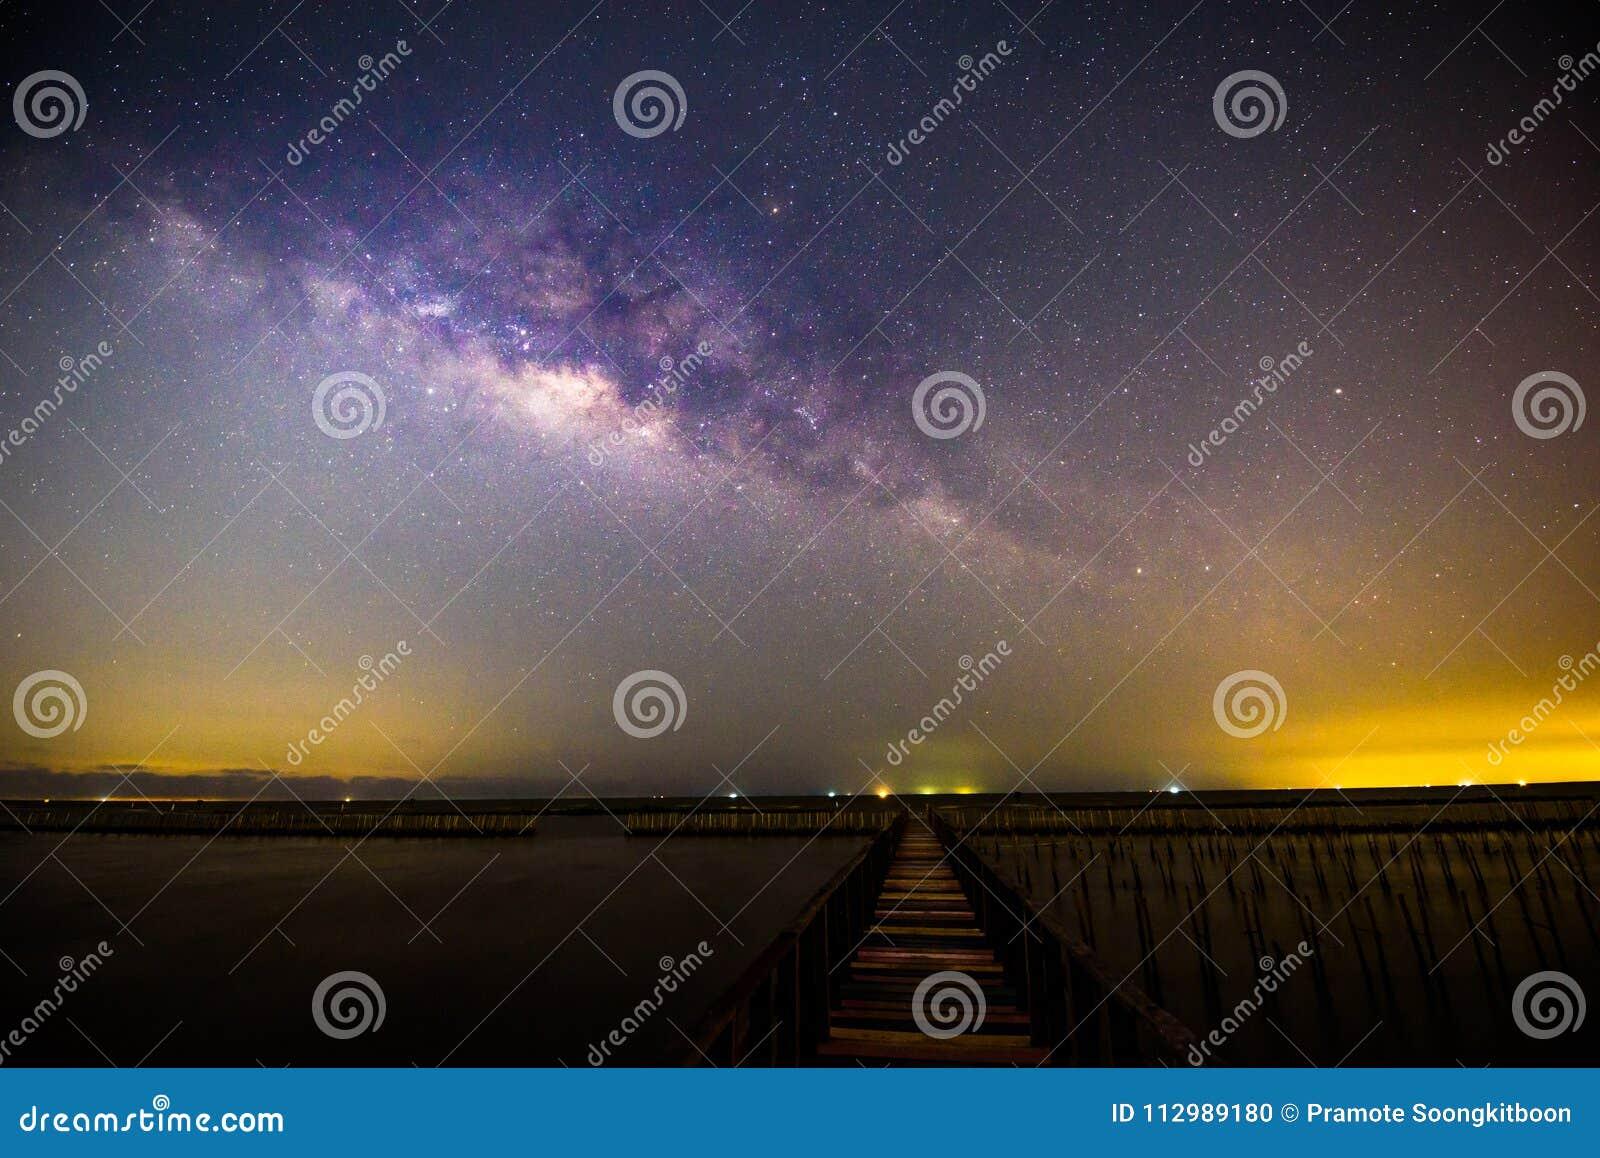 Milky way at the bridge